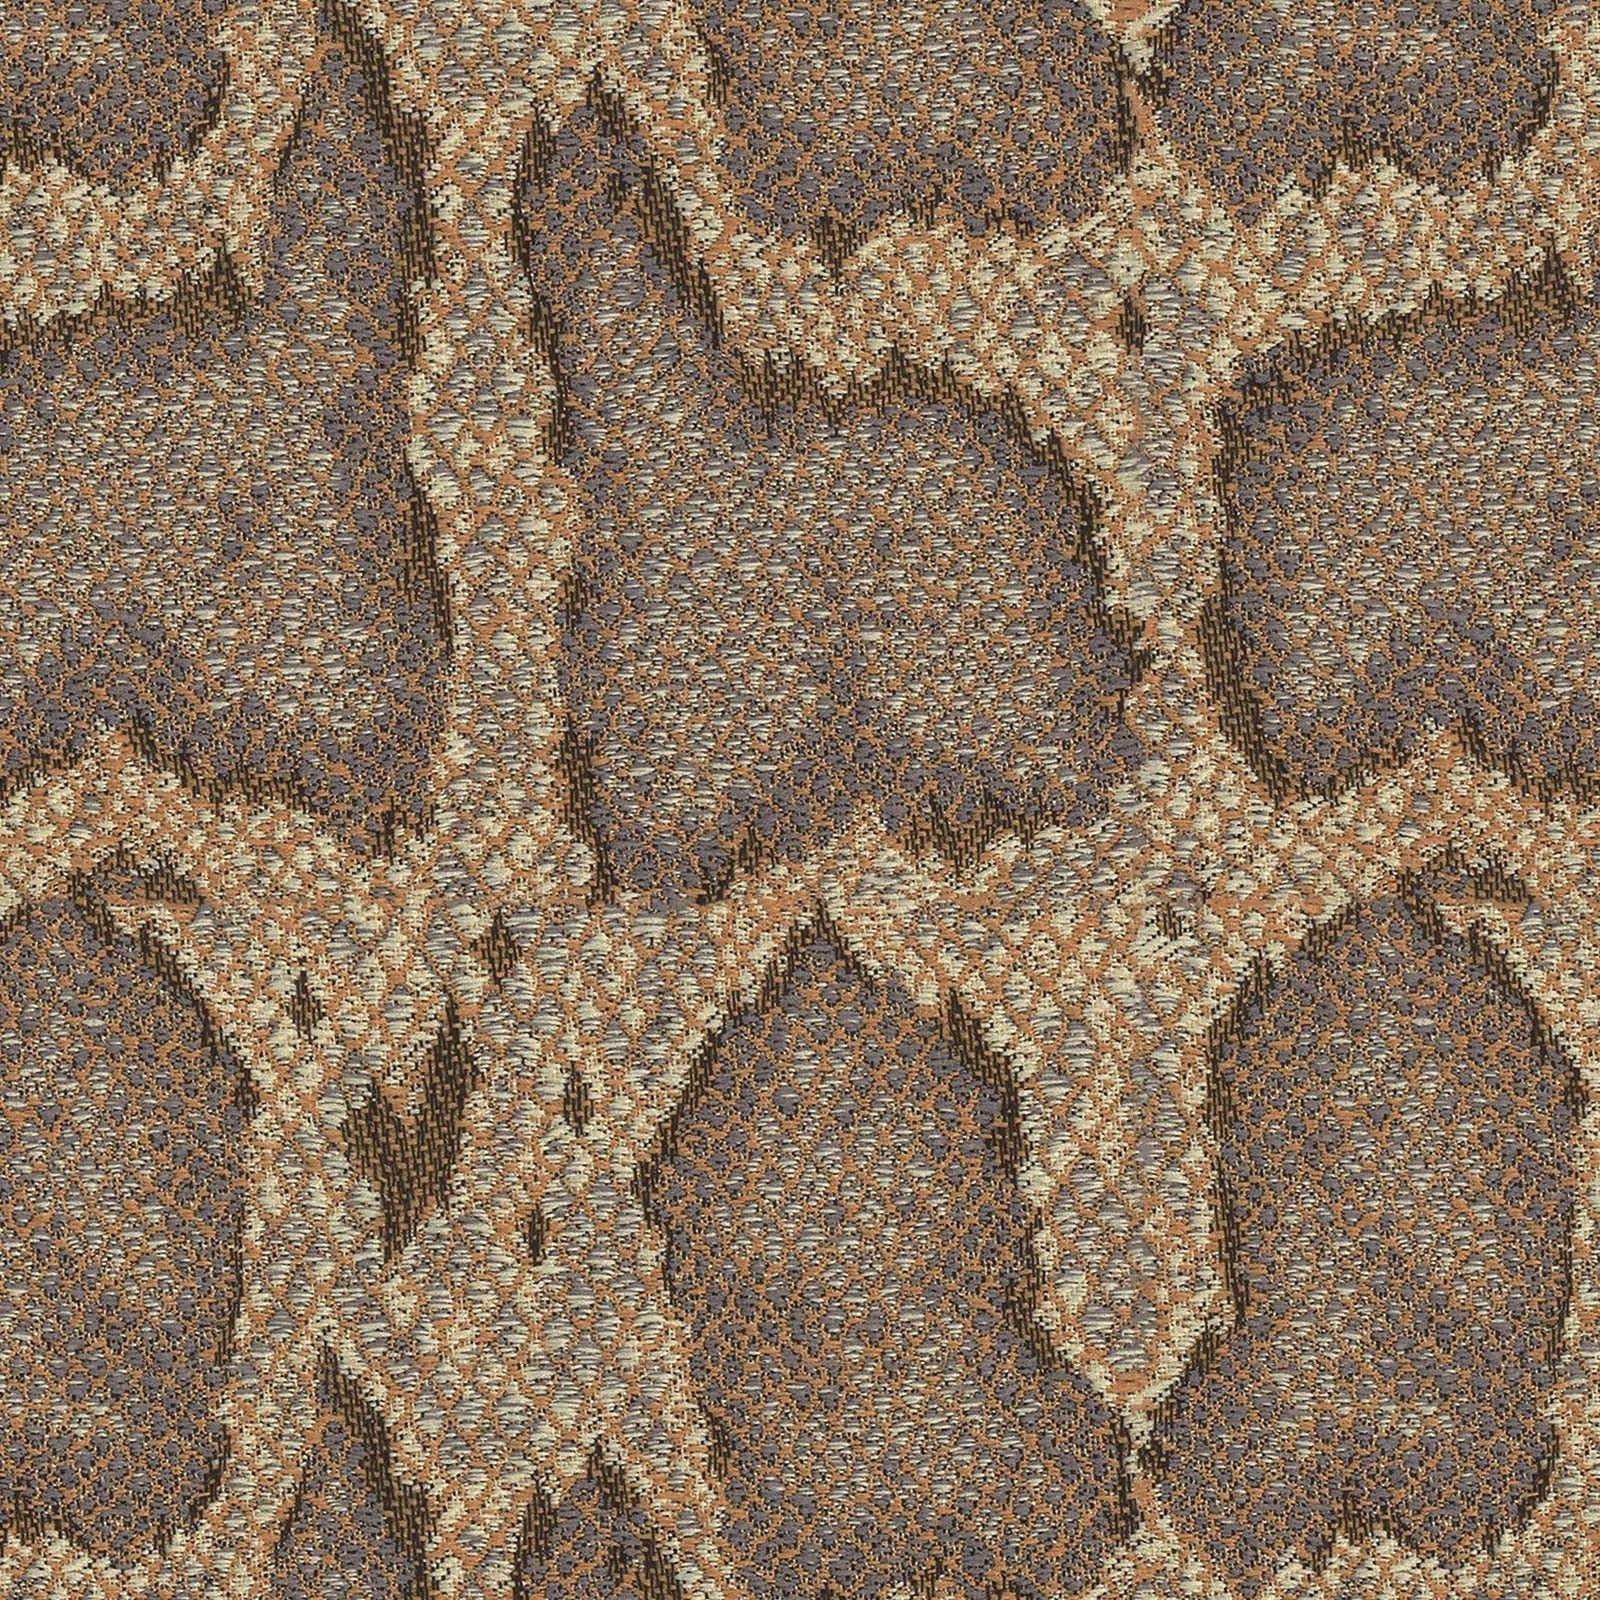 Reptile Skin Effect WallpaperTaupe /& Shimmer